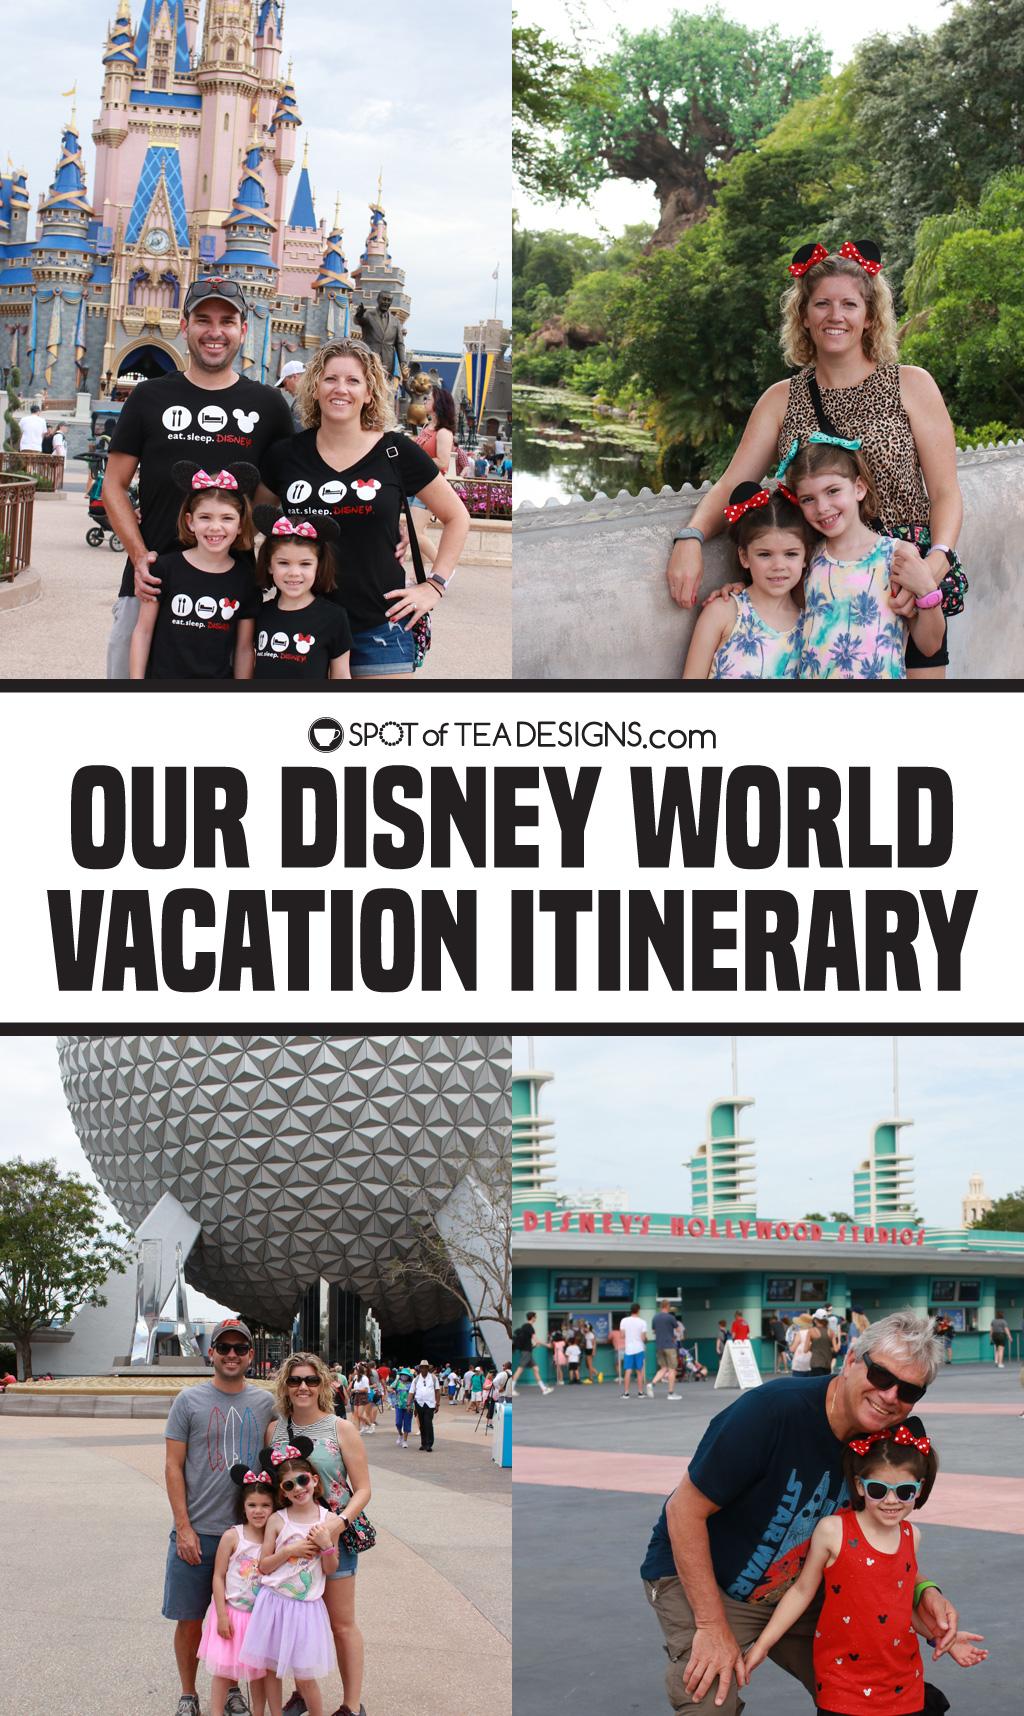 Our Disney World Vacation Itinerary | spotofteadesigns.com